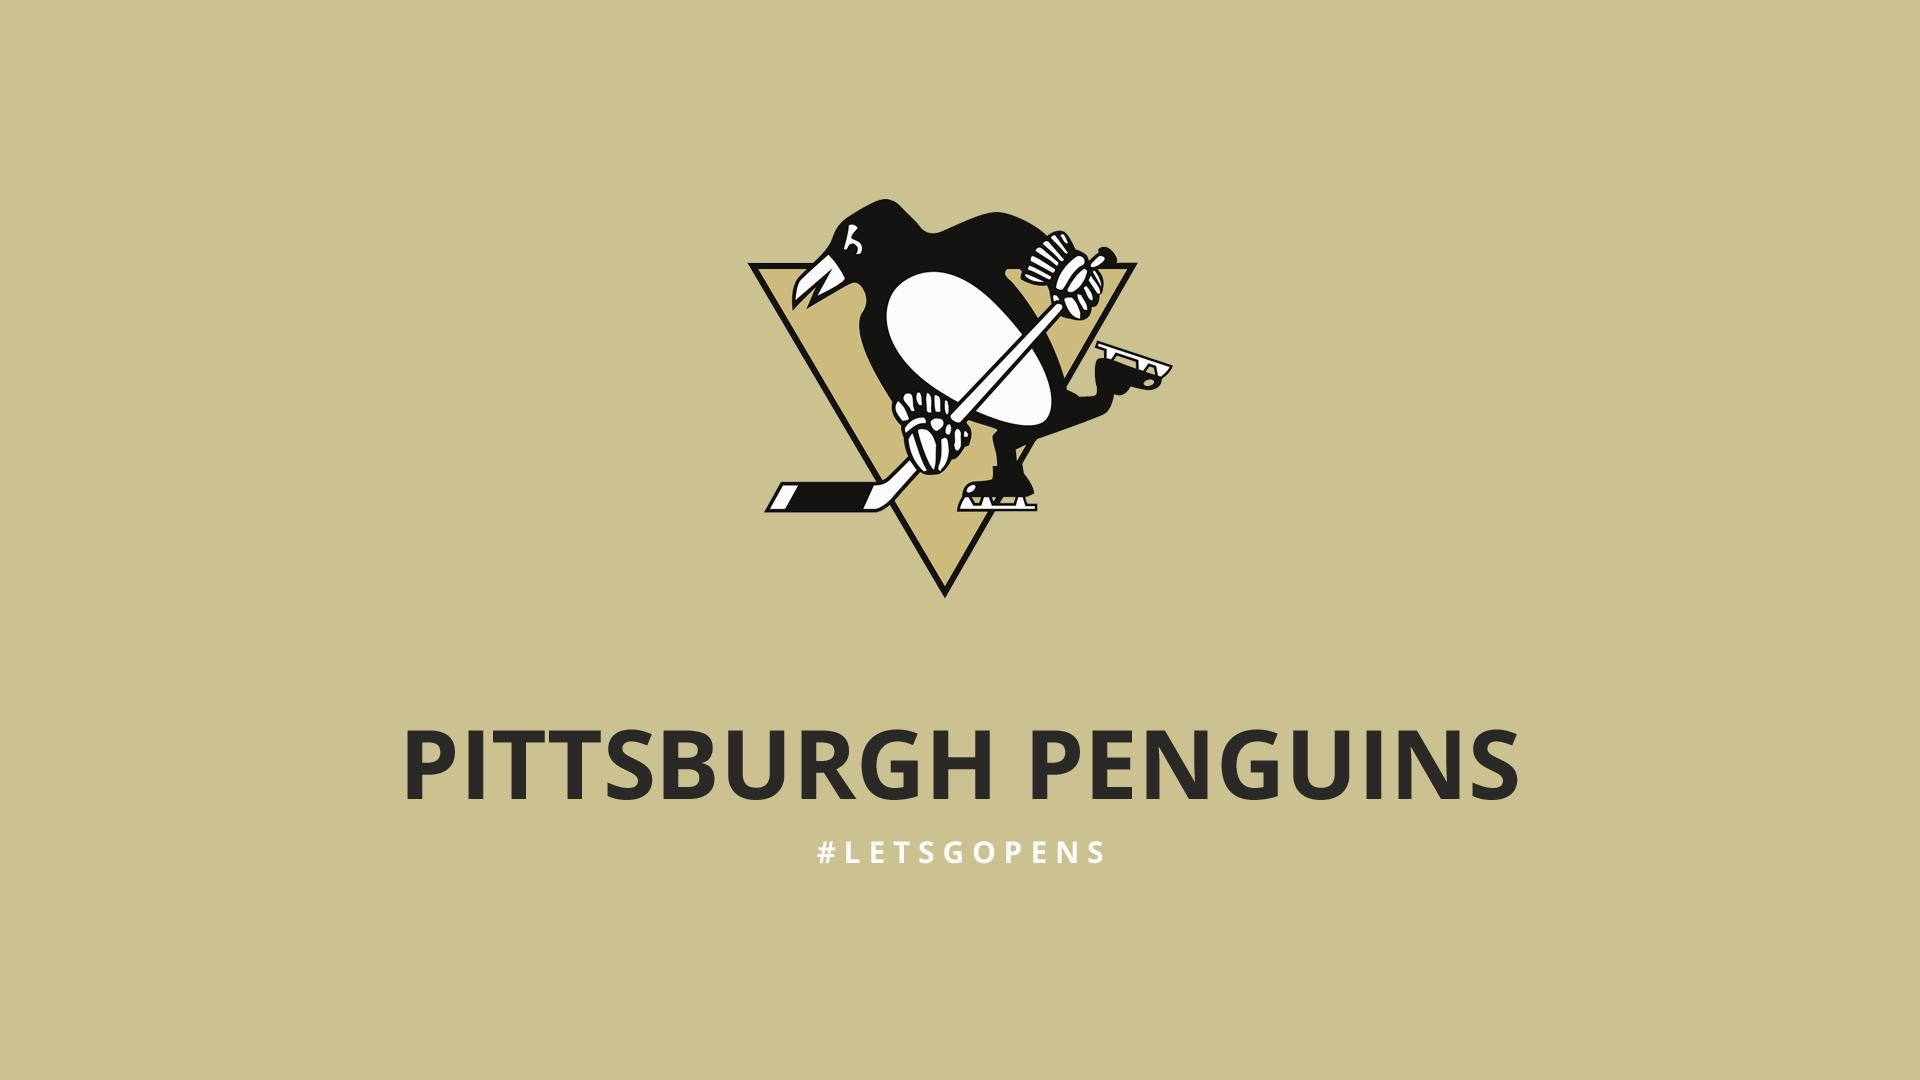 wallpaper.wiki-Free-Images-Pittsburgh-Penguins-Logo-Wallpapers-